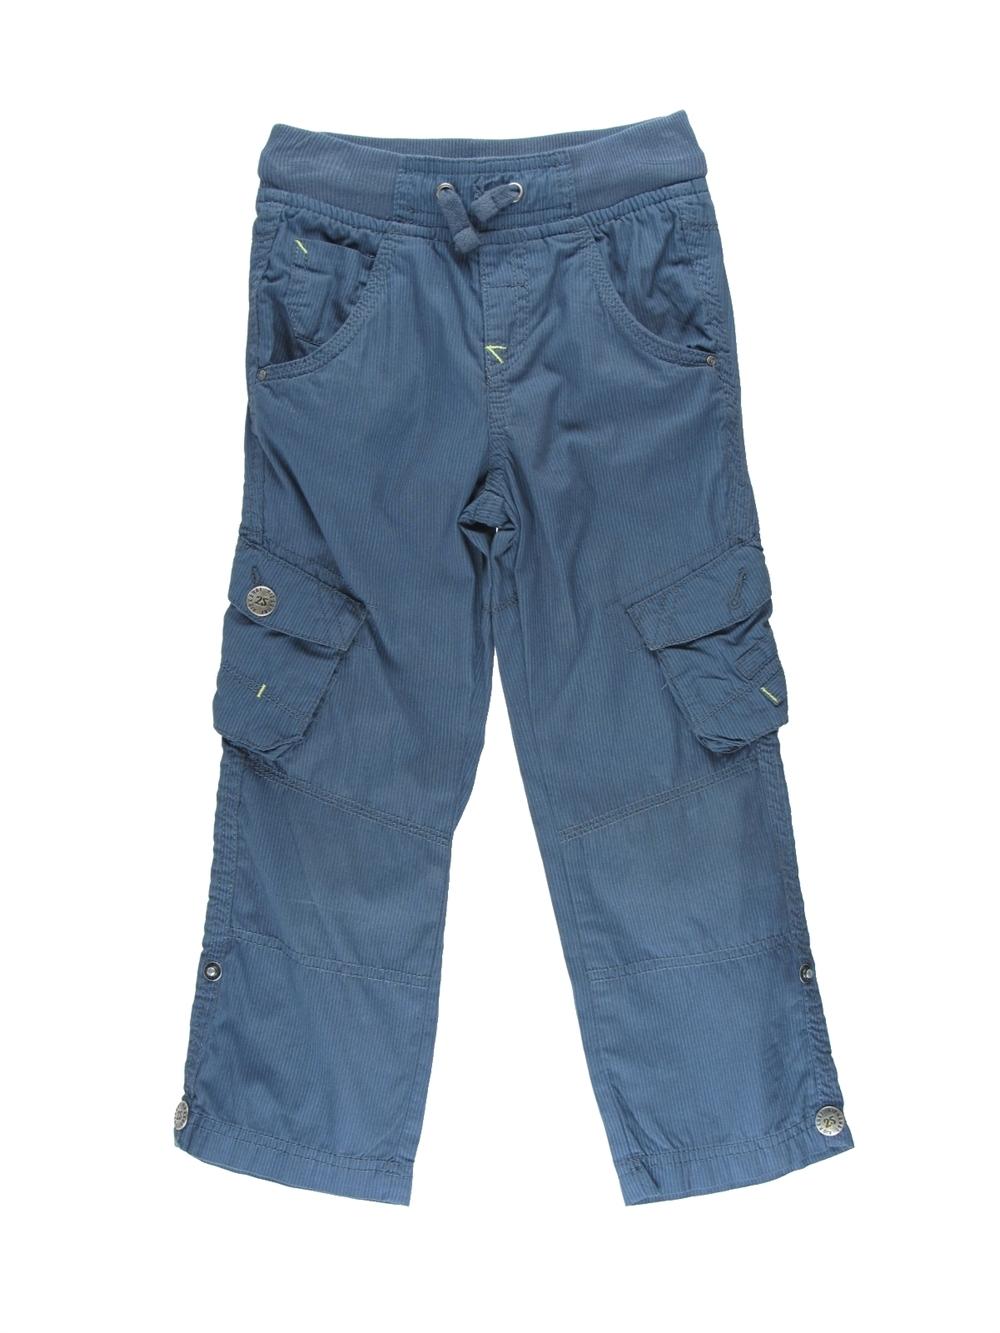 pantalon garcon kiabi 4 ans pas cher. Black Bedroom Furniture Sets. Home Design Ideas